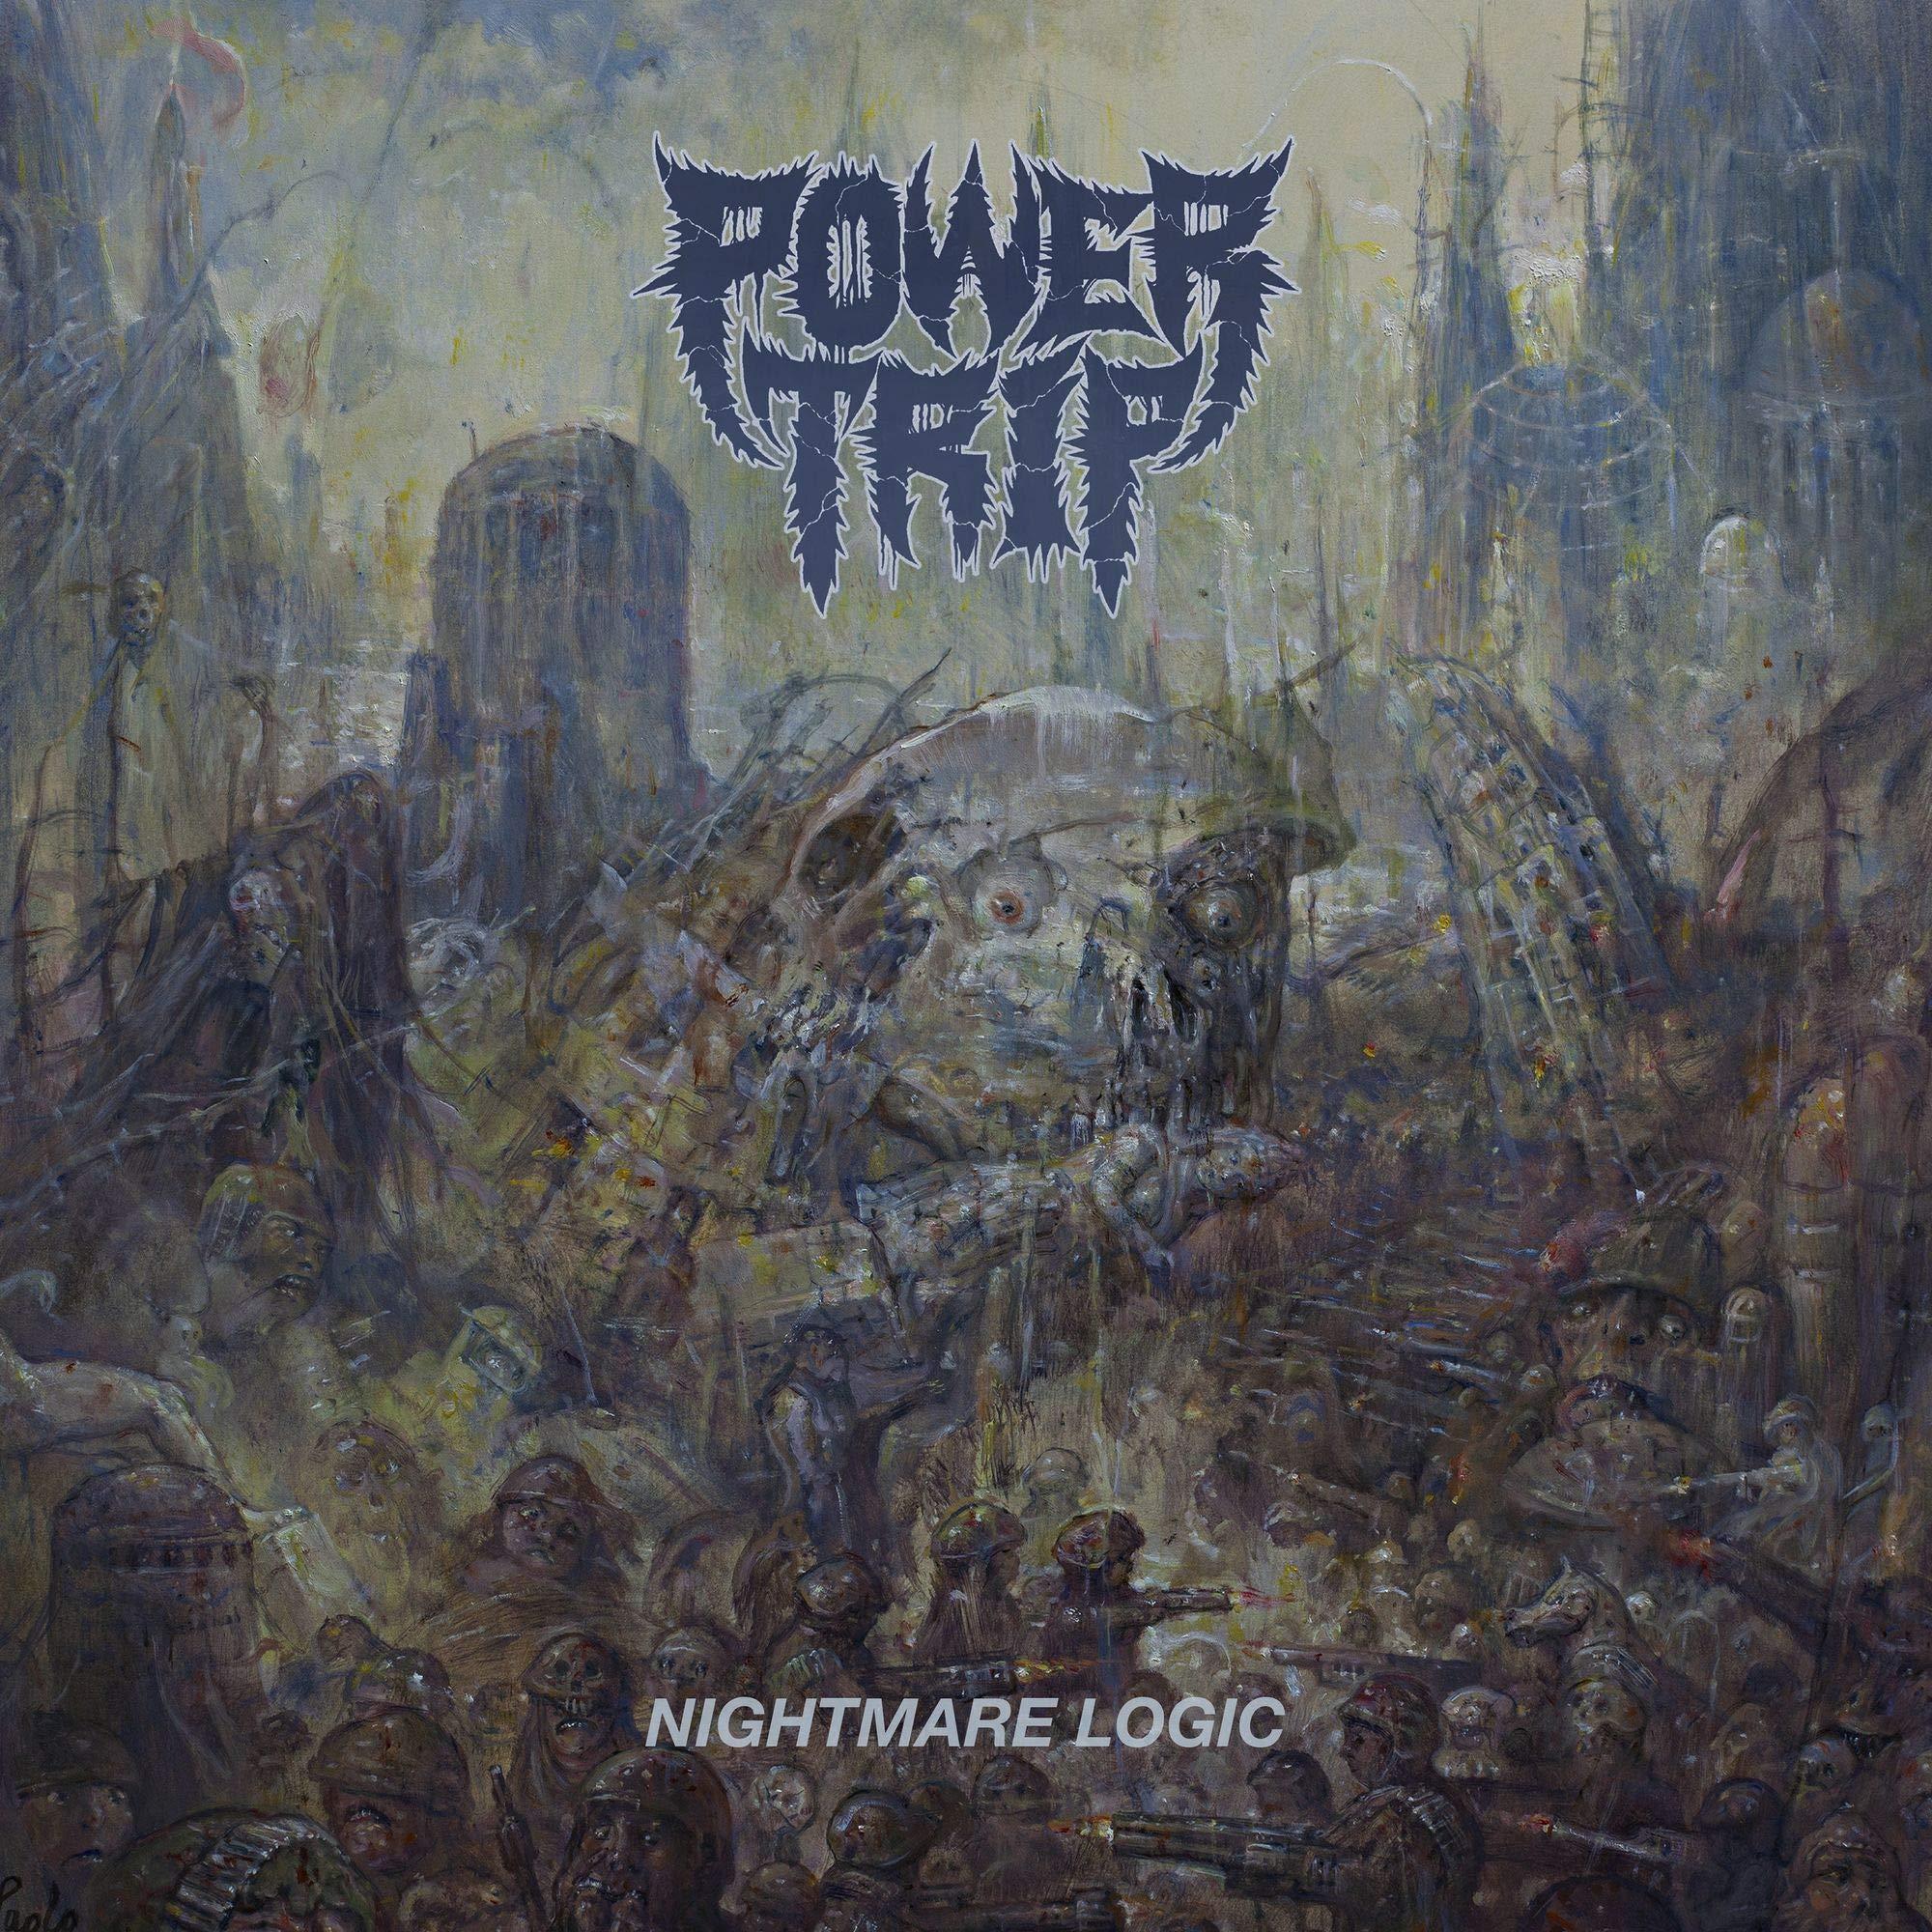 Cassette : Power Trip - Nightmare Logic (Cassette)